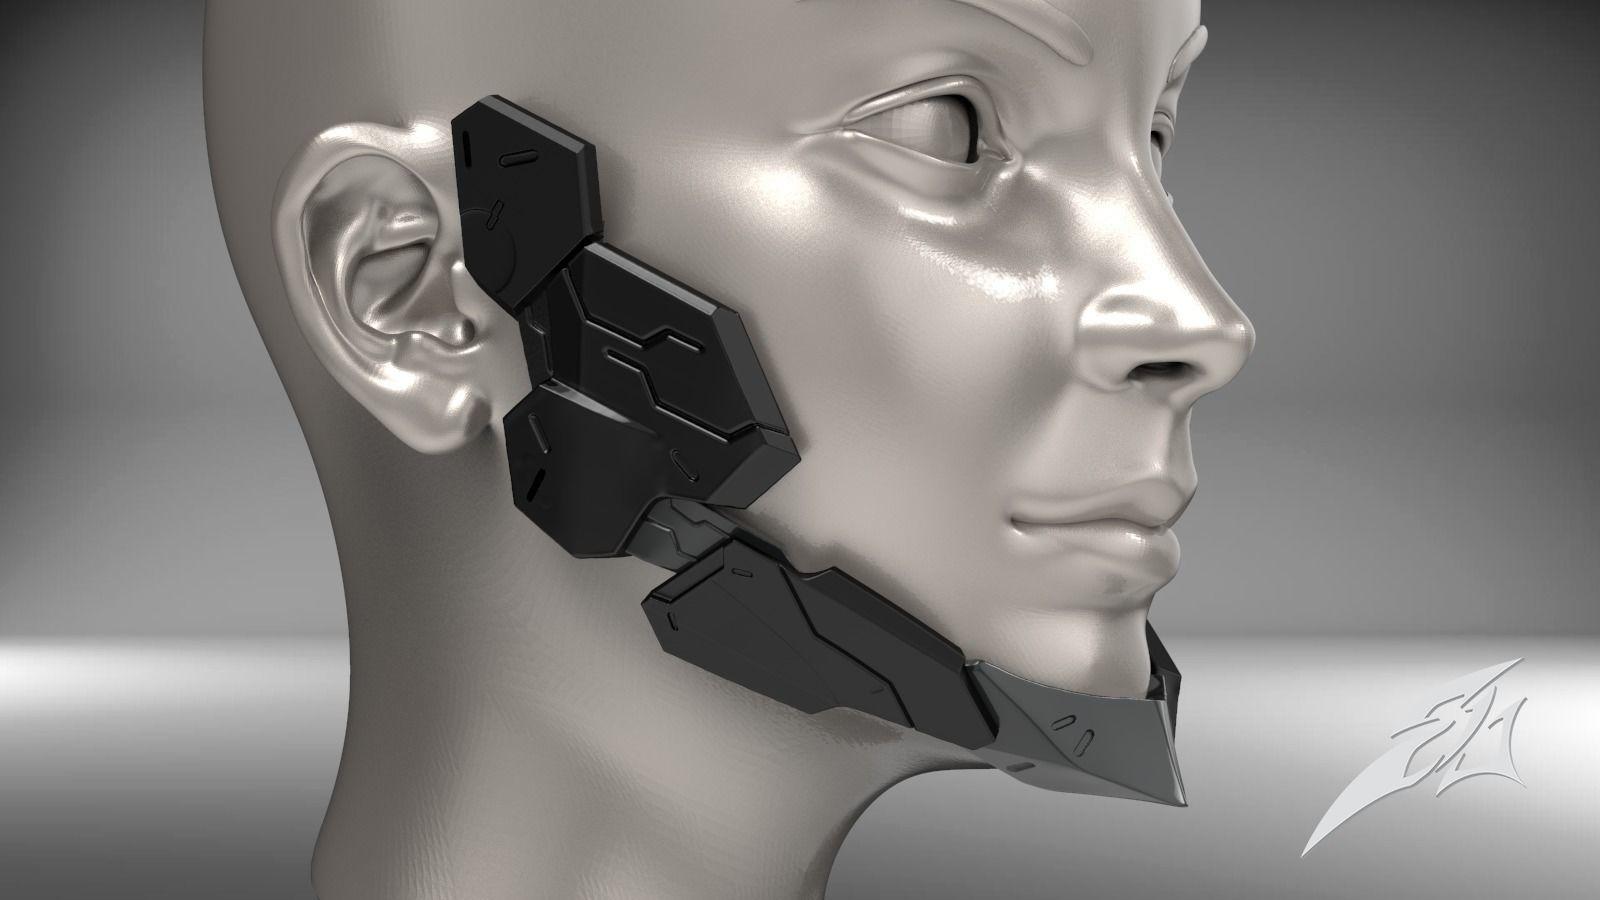 Cyborg Jaw Armor Wearable